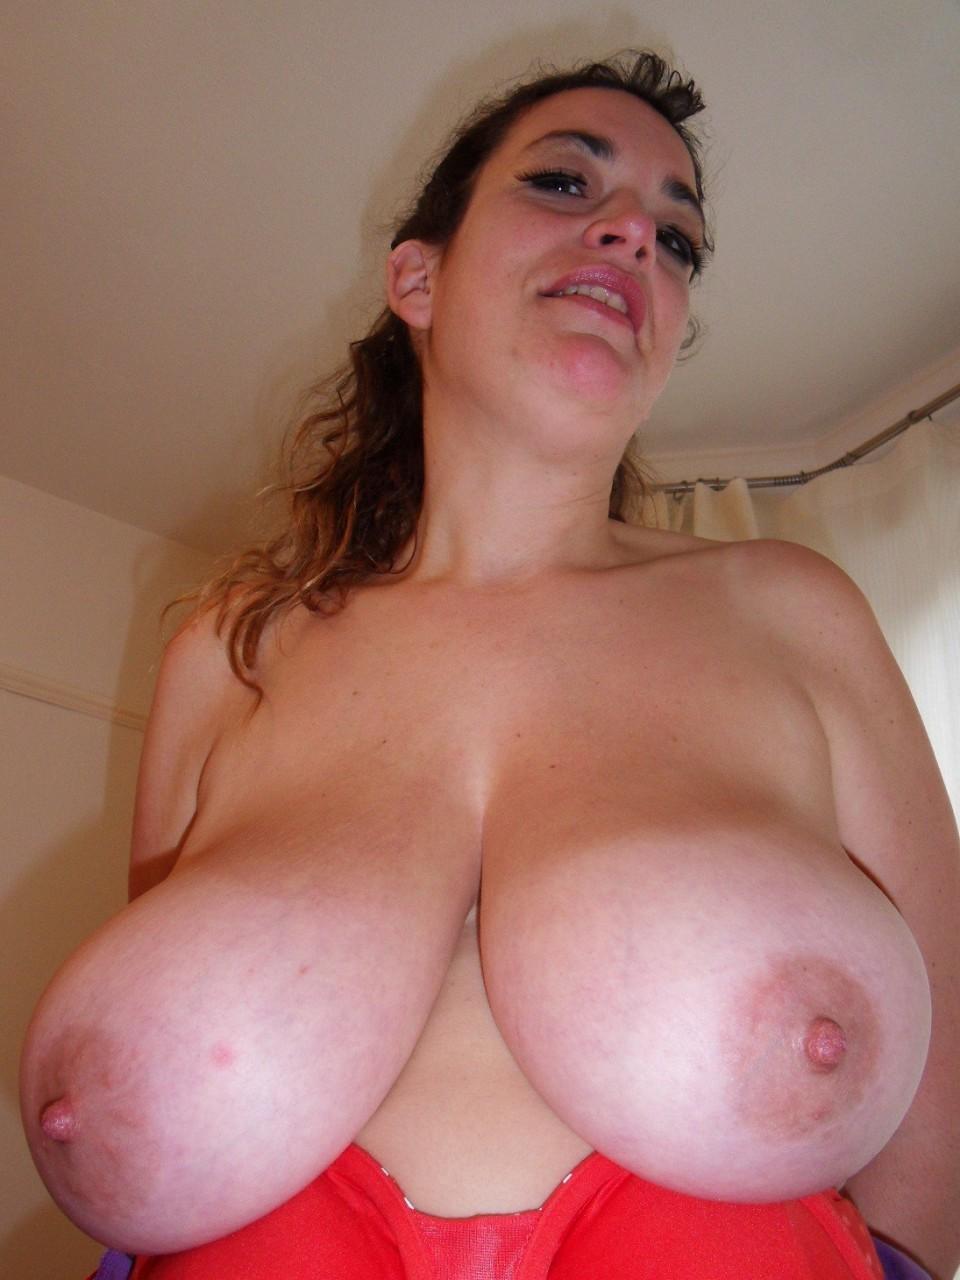 Cum on saggy tits